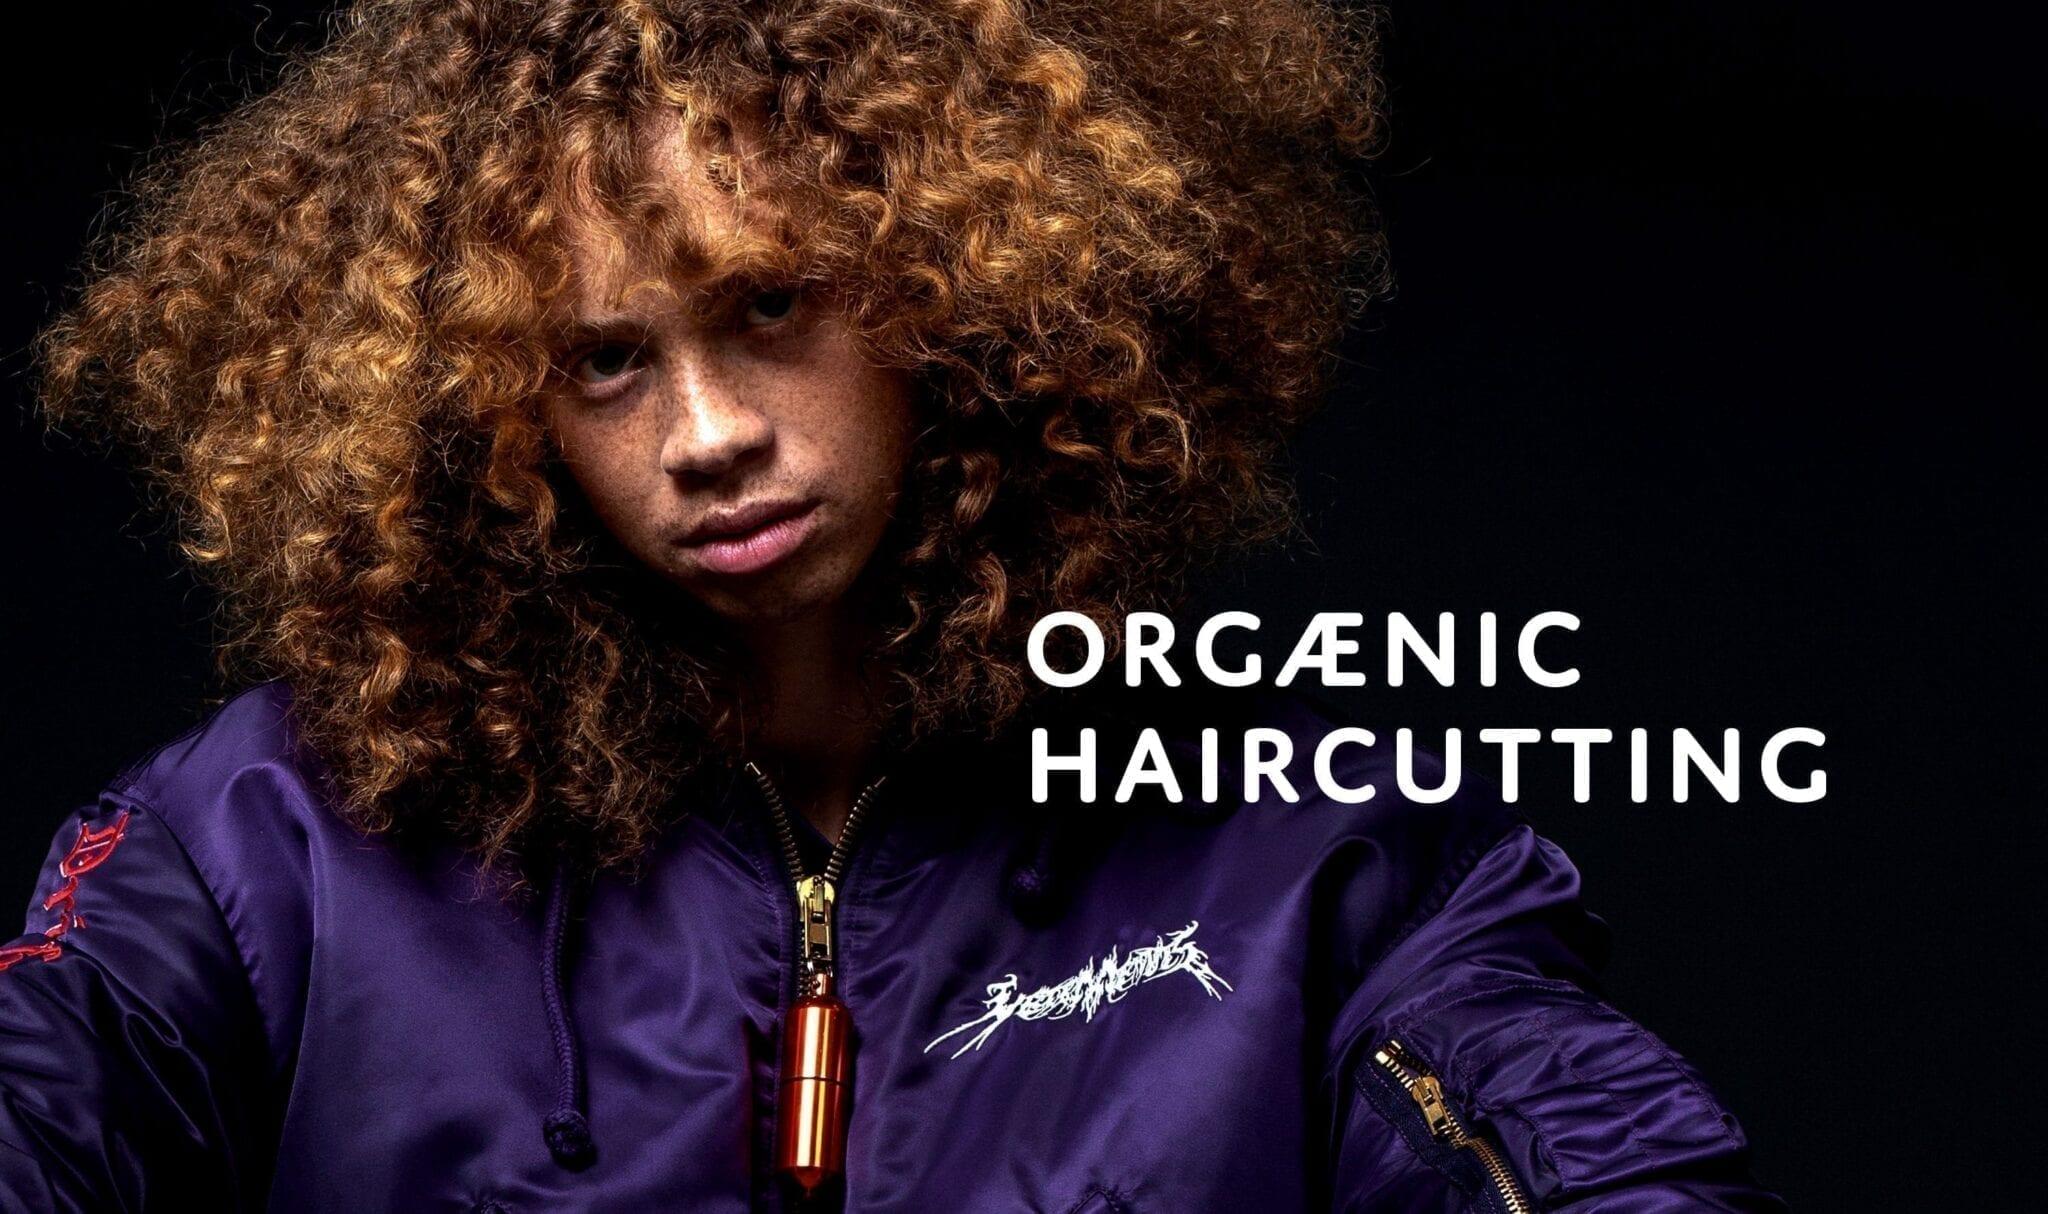 Orgænic Haircutting Orgænic Lifestyle